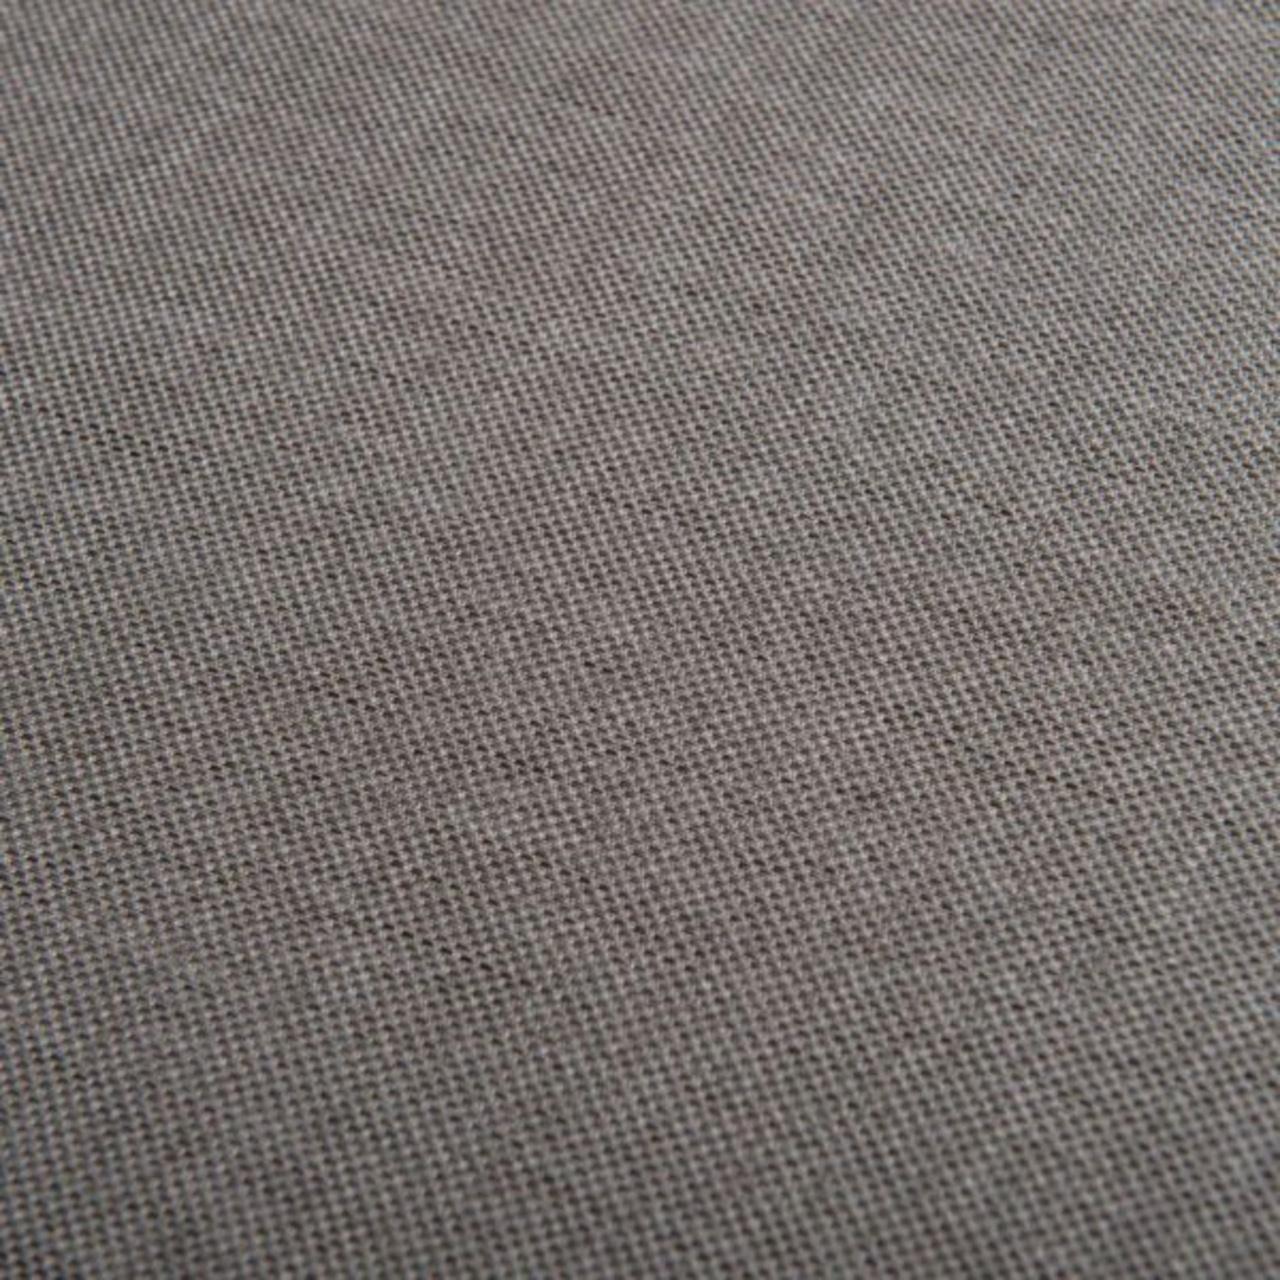 Linge De Table Sienne Polyester 195 Grs M2 Professionnel Restaurant Linvosges Hotellerie